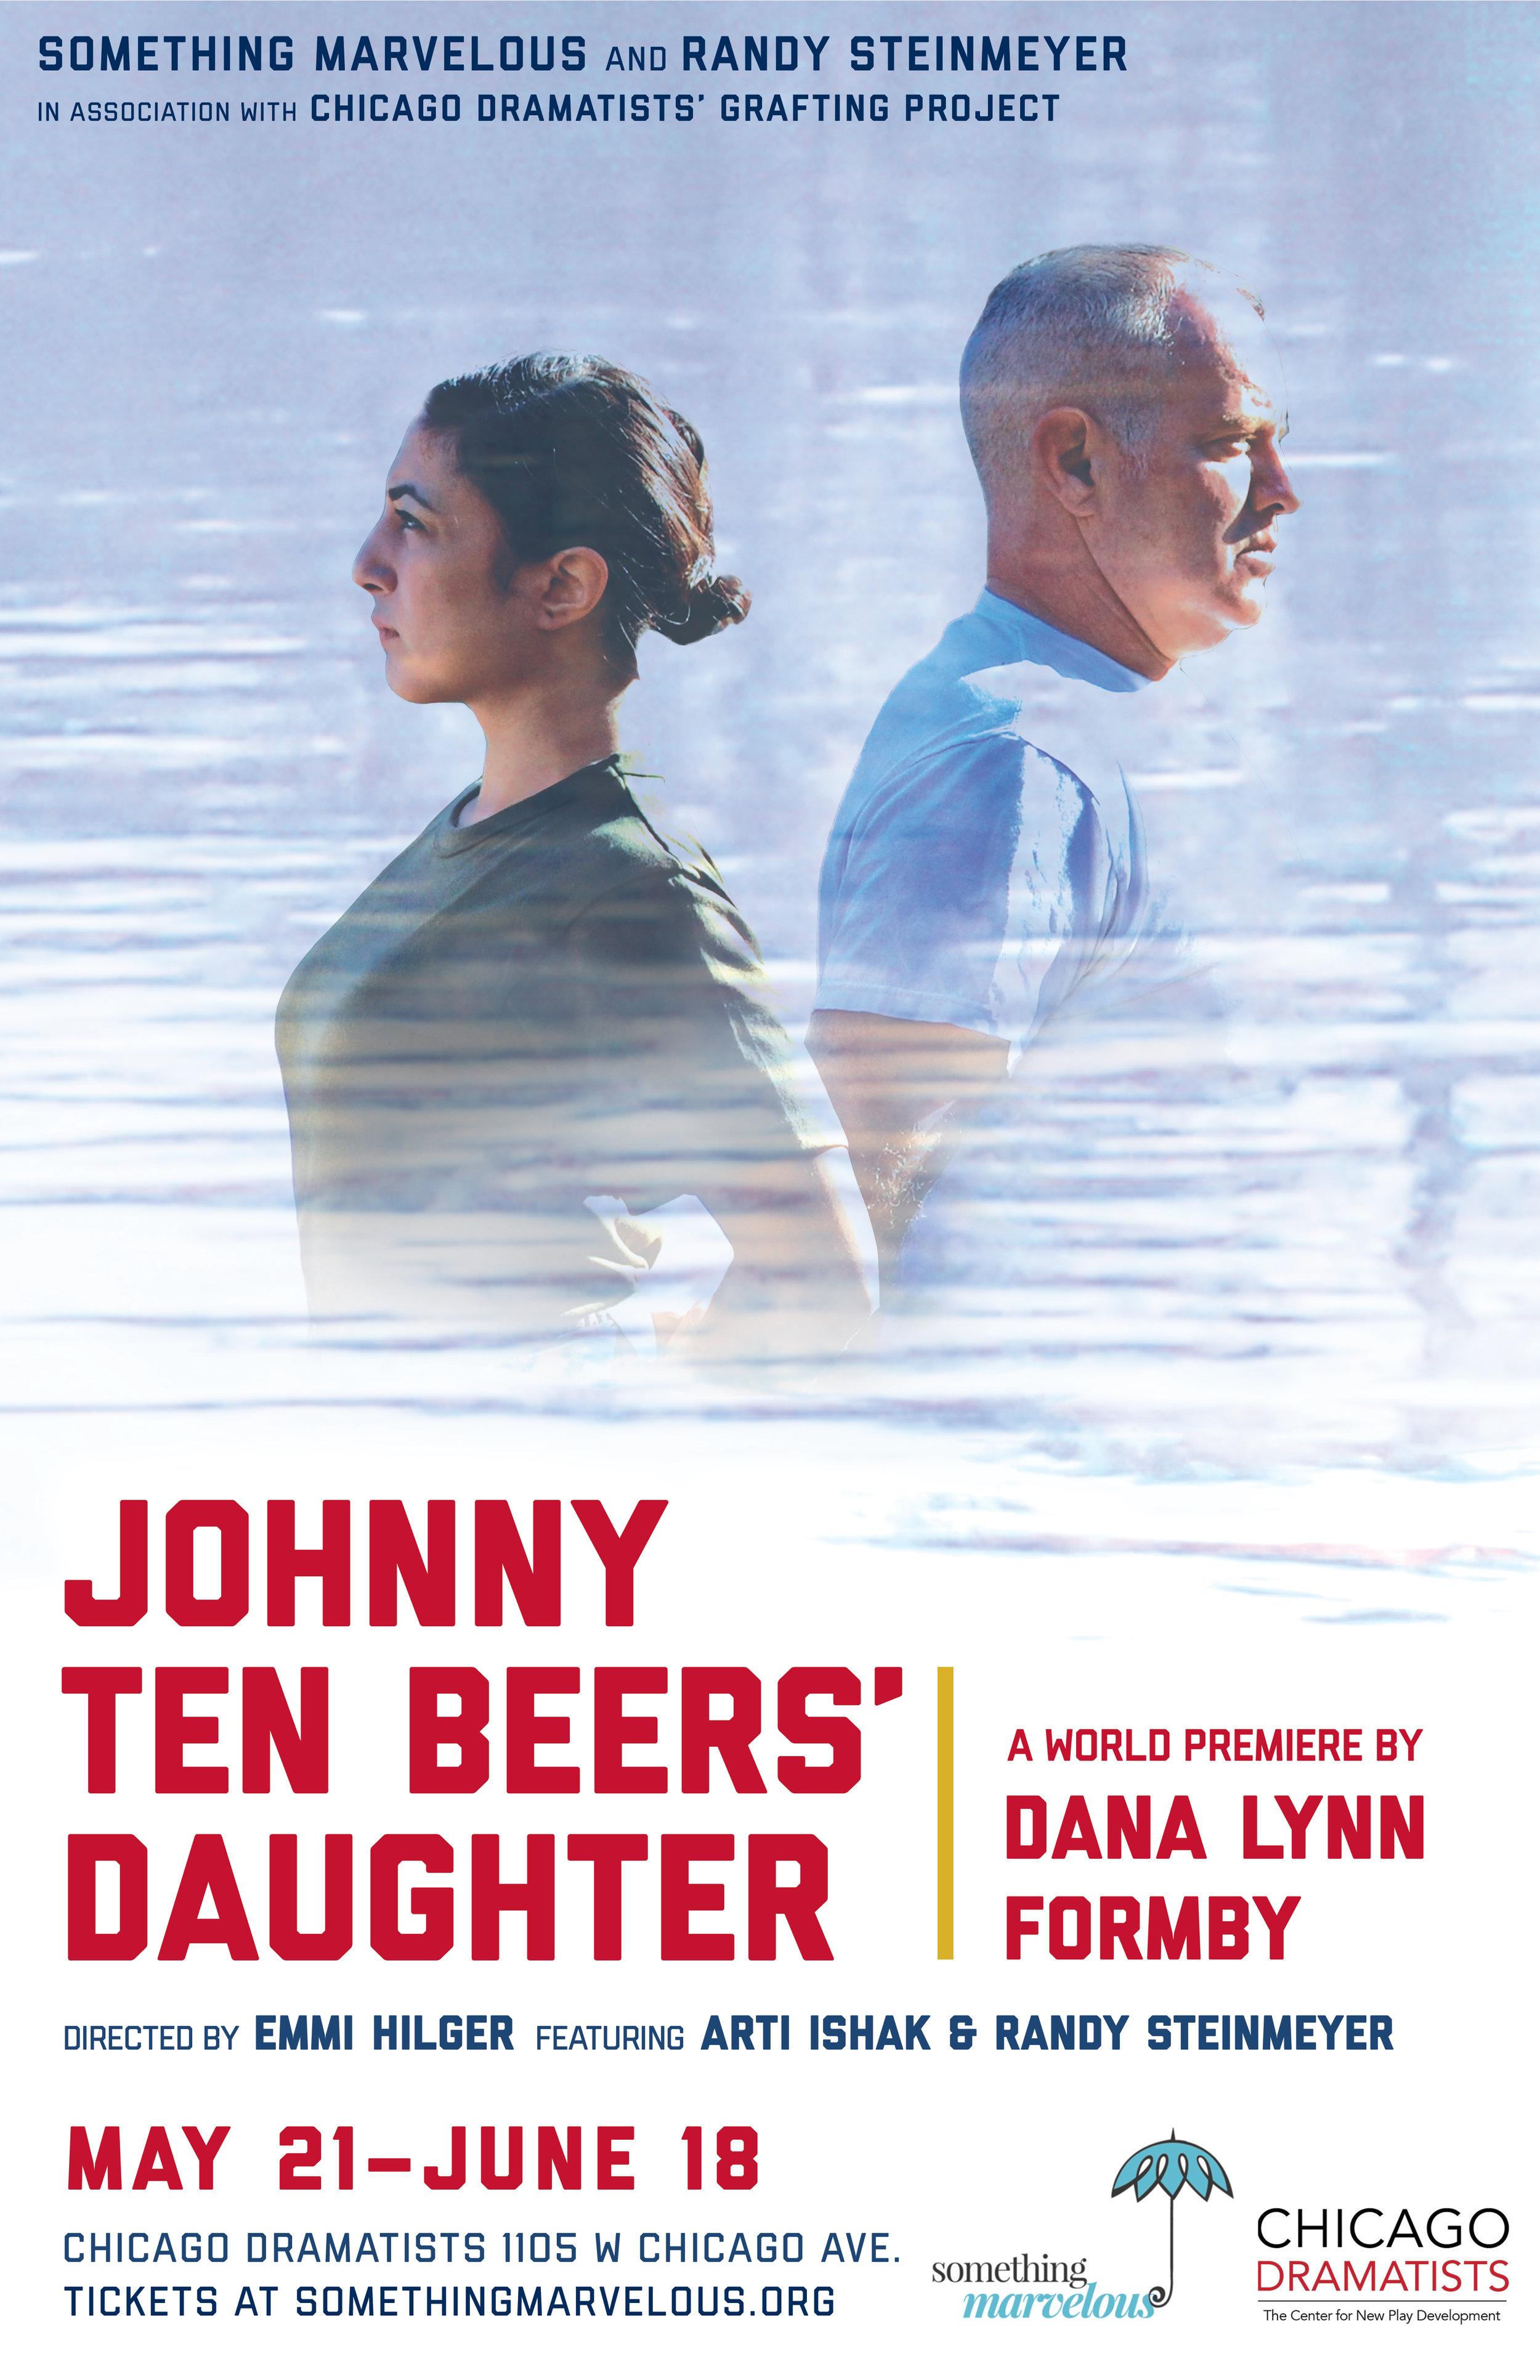 johnny10beersdaughter